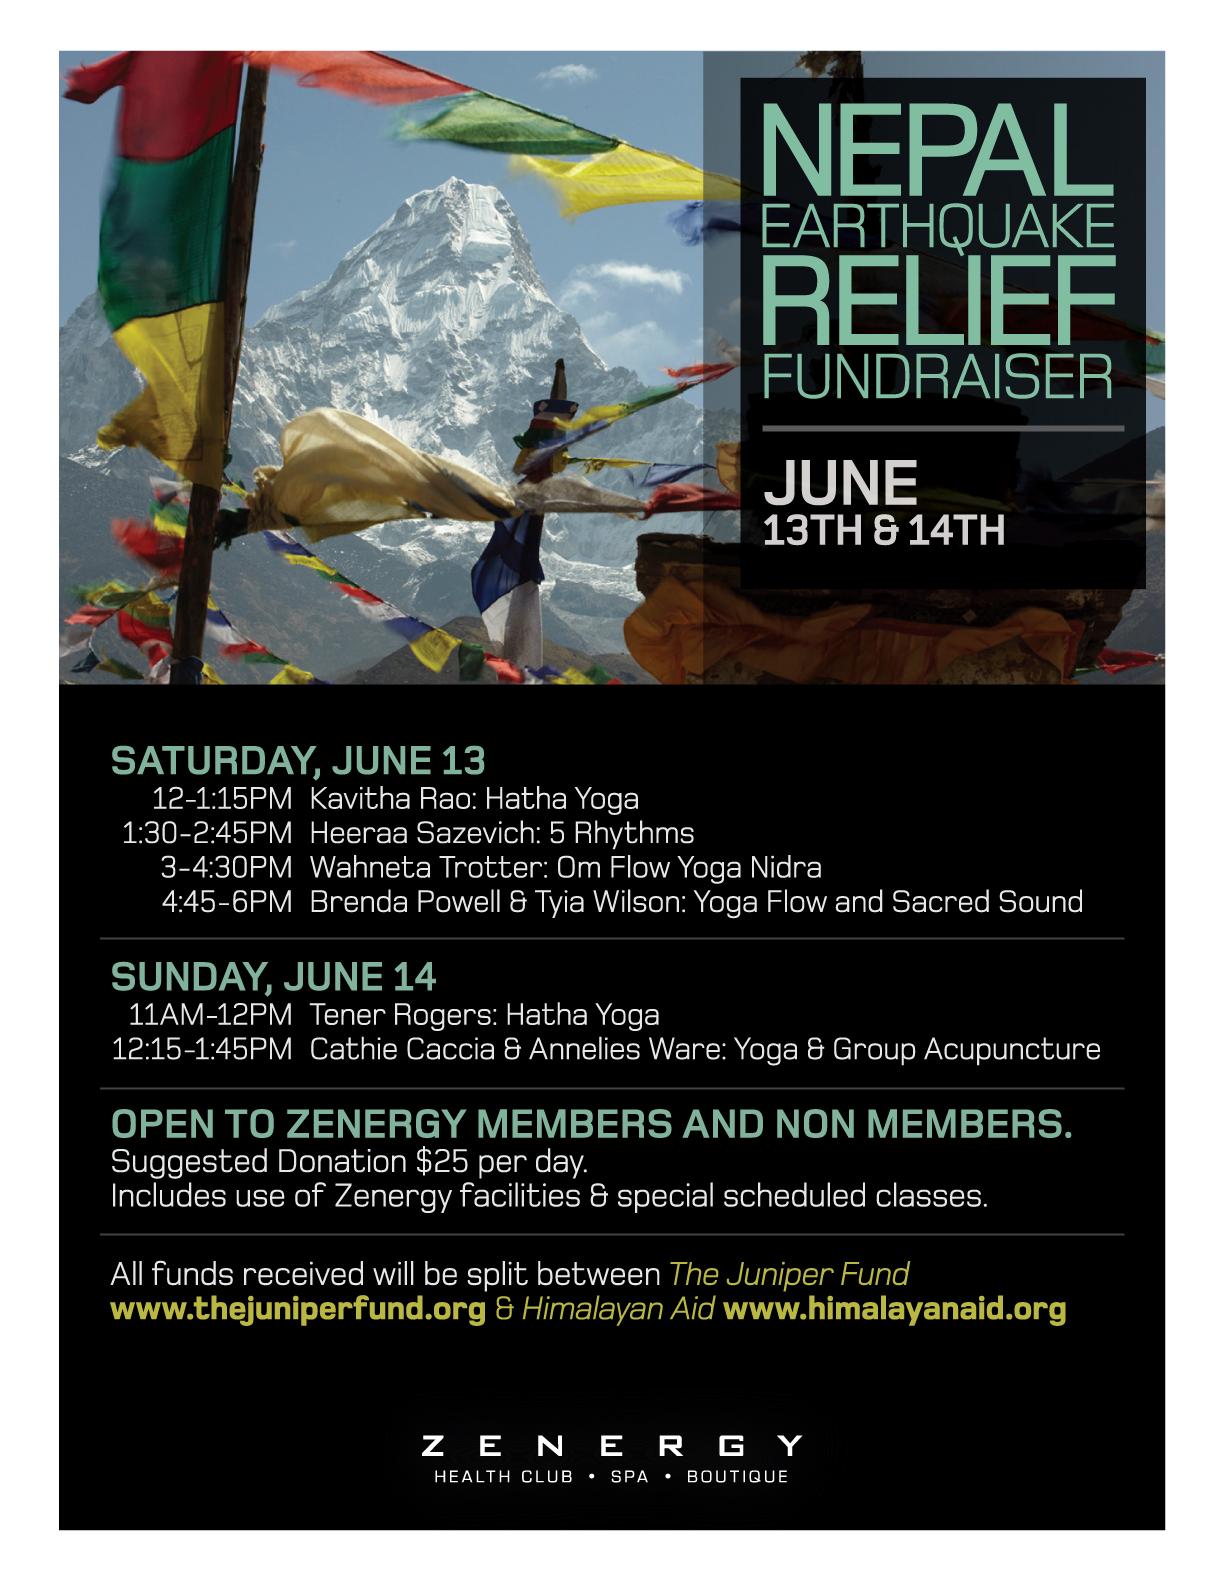 Nepal fundraiser